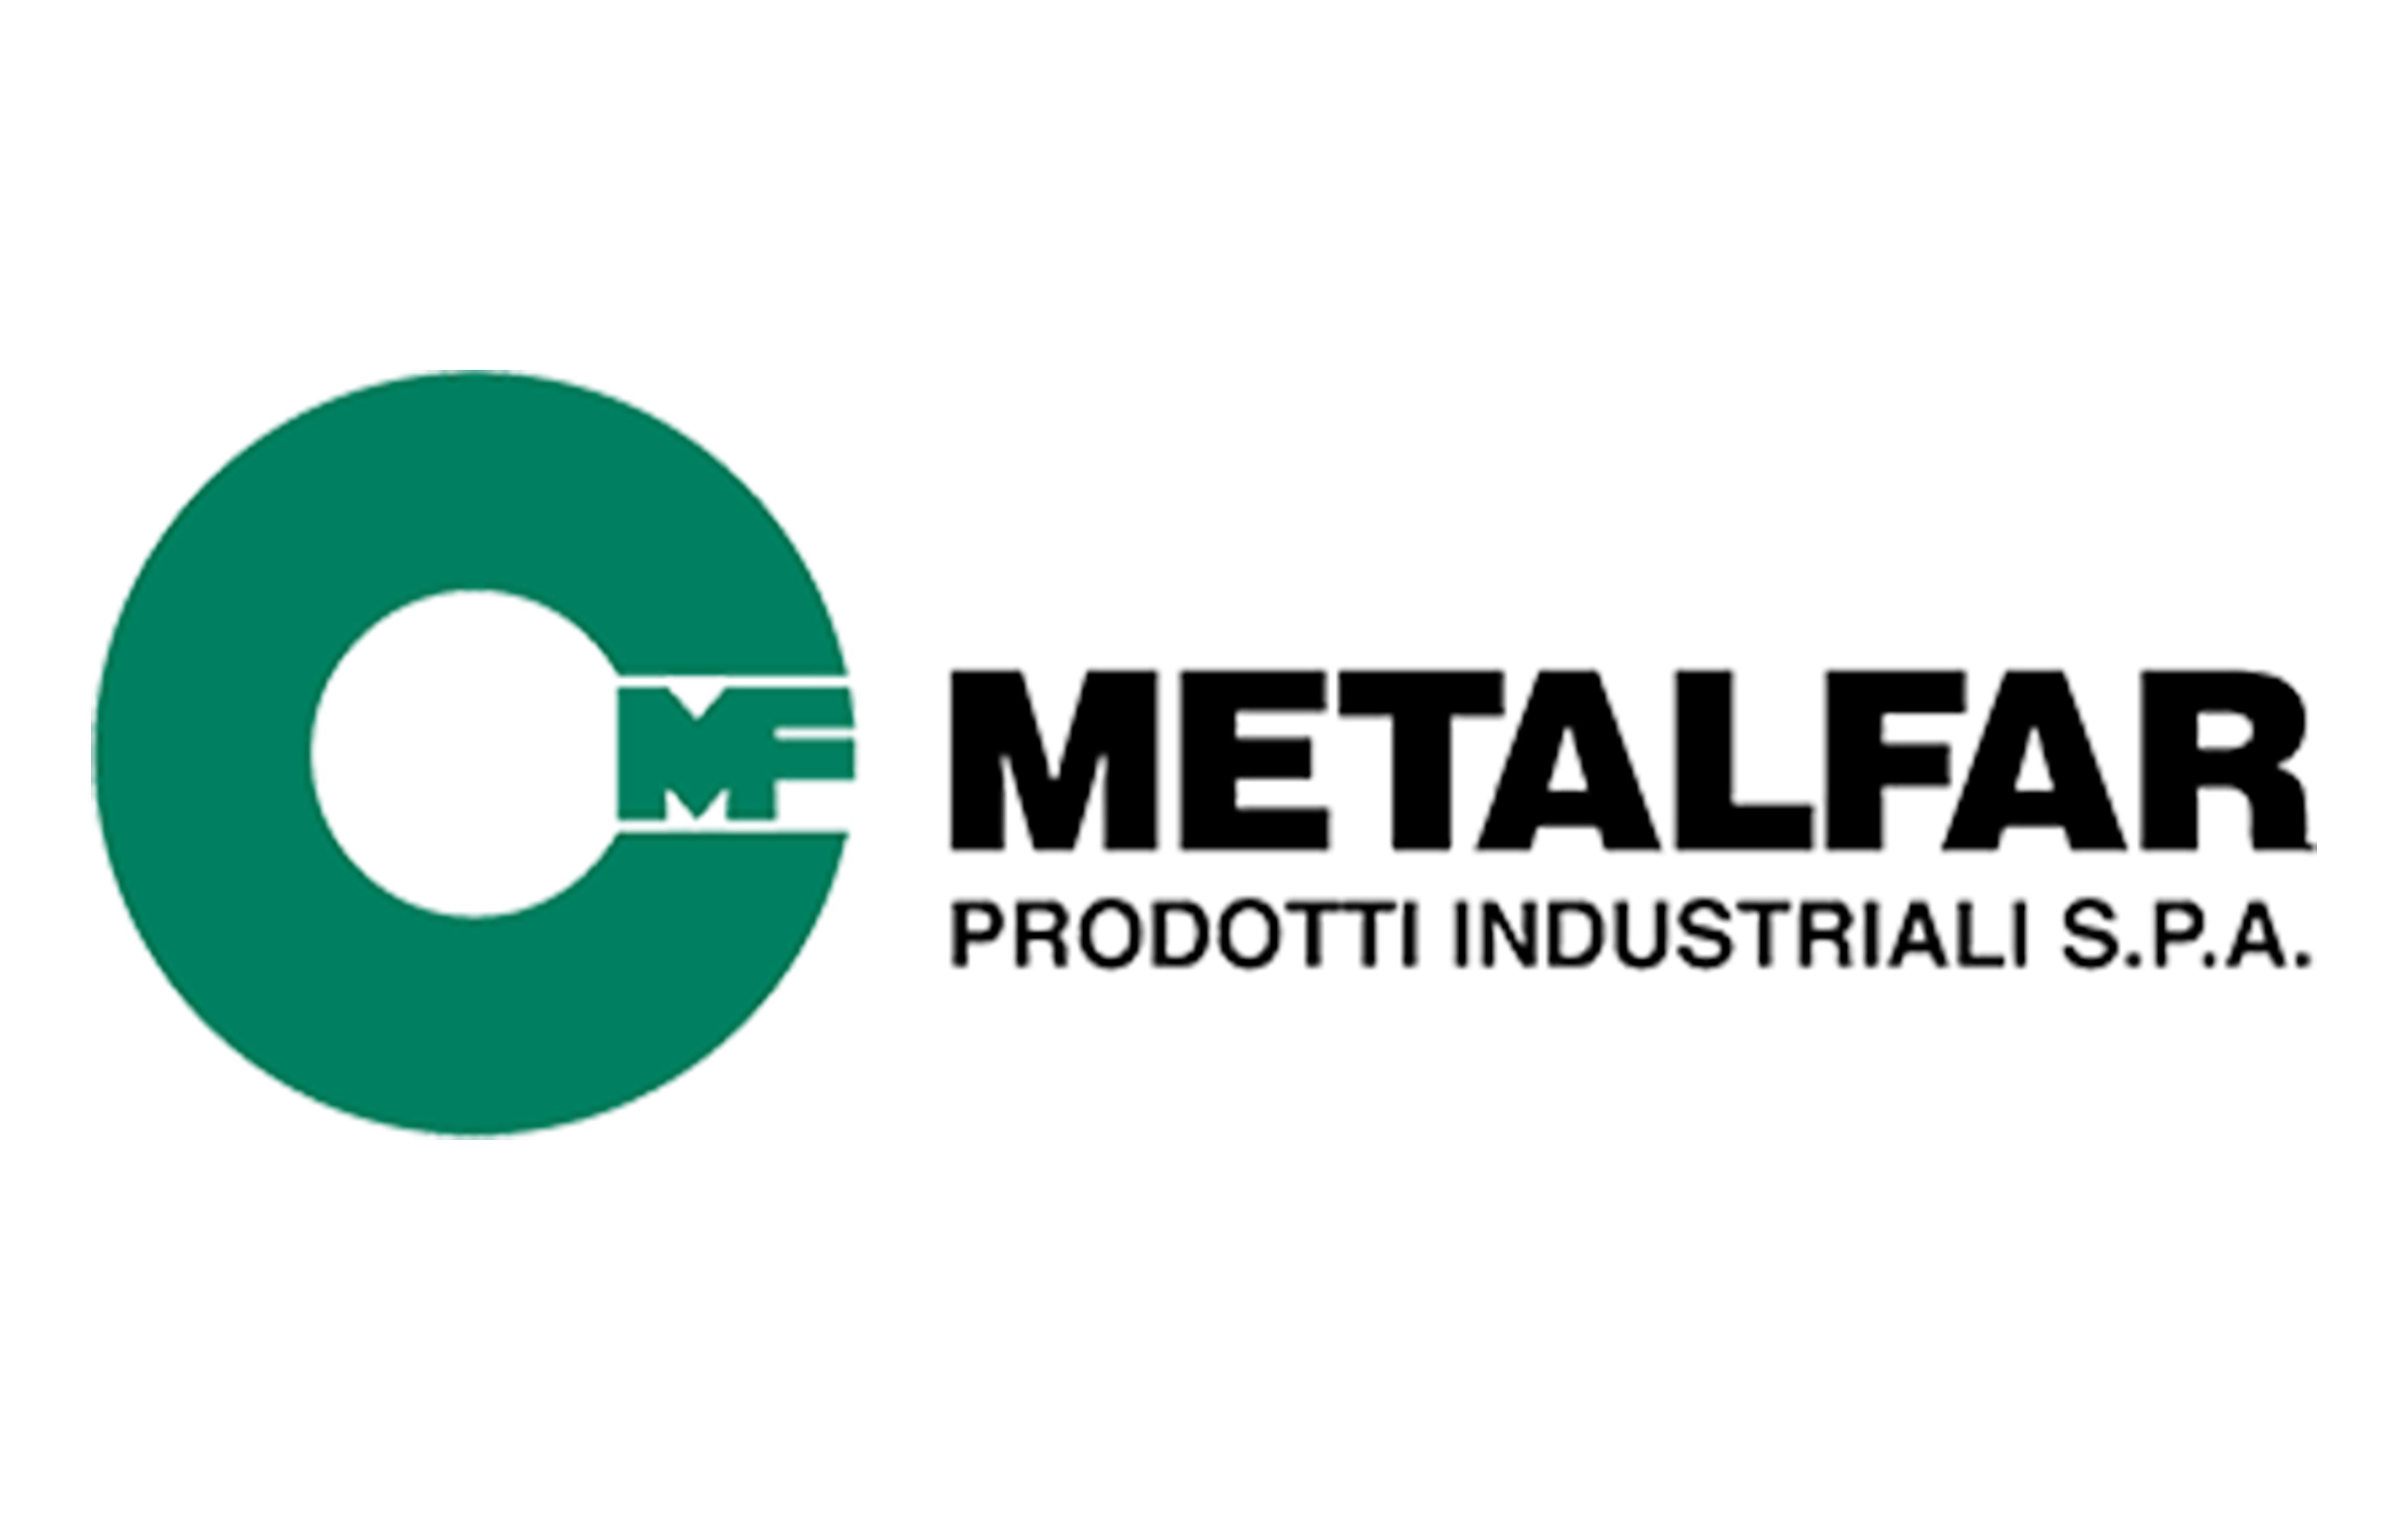 Metalfar Logo